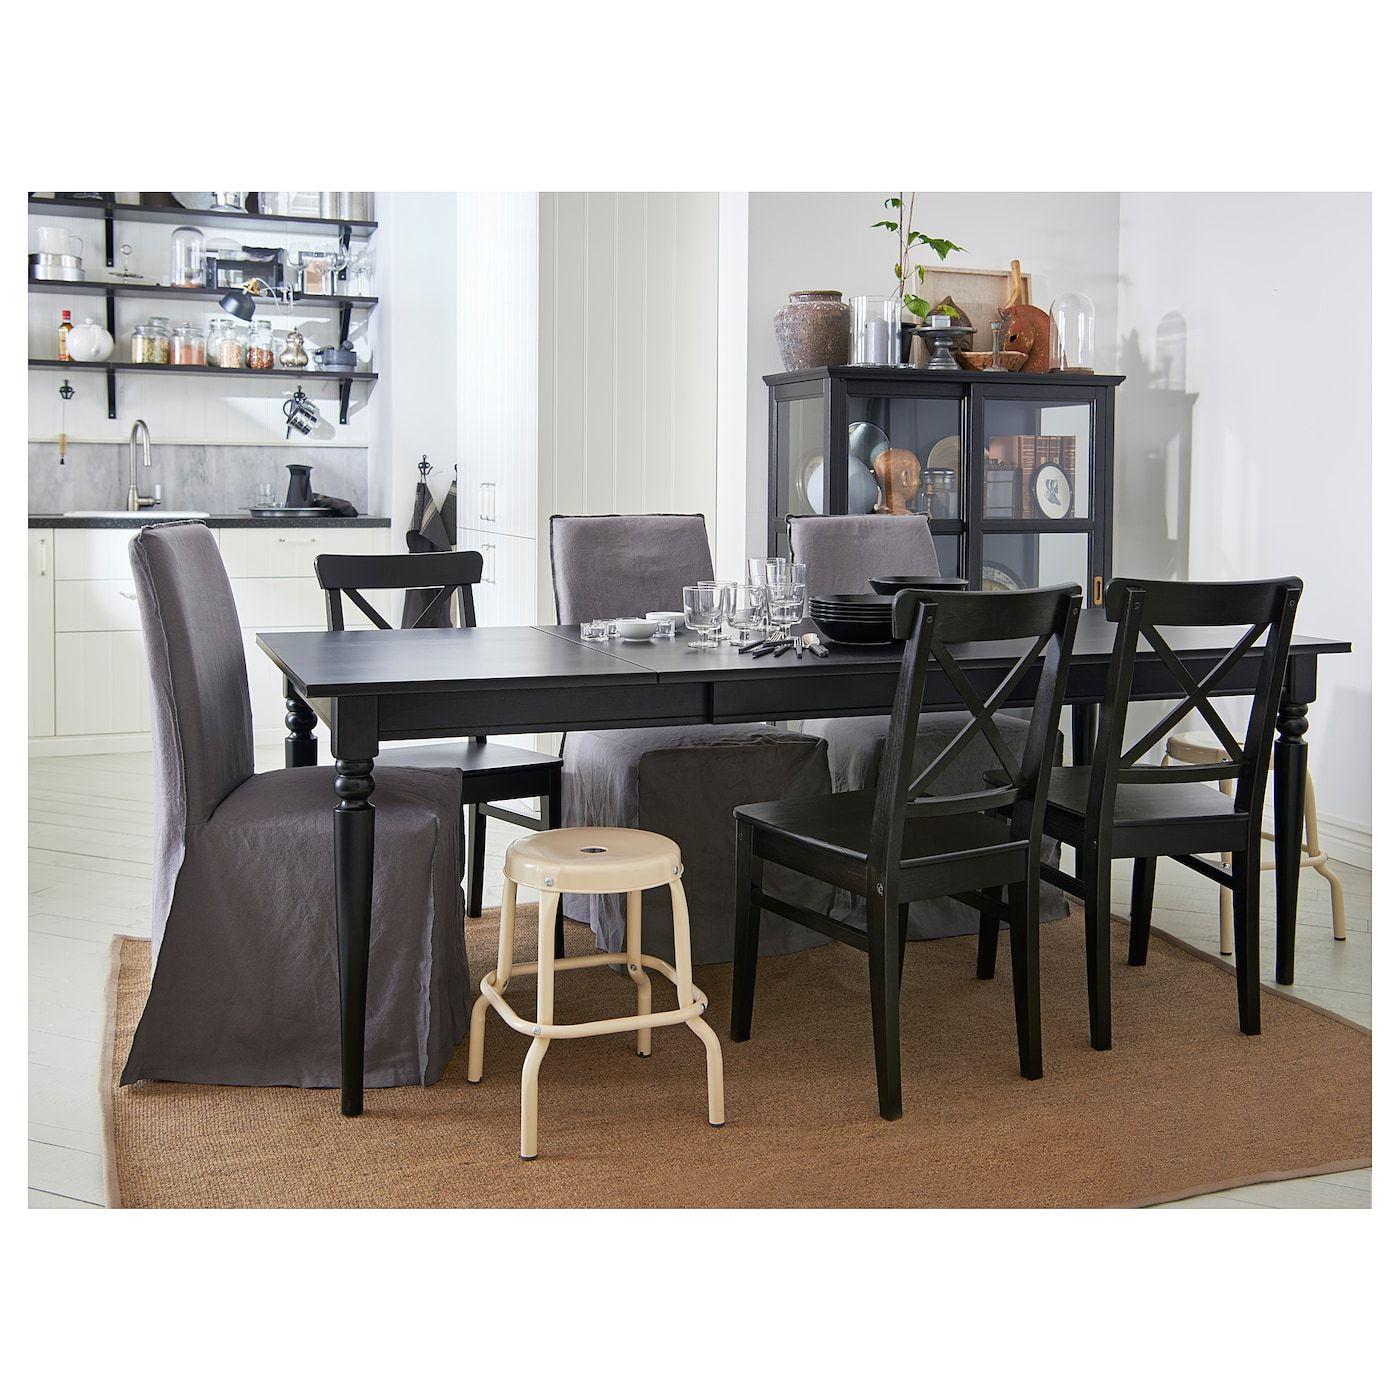 Ingatorp Extendable Table Black 61 84 5 8x34 1 4 Ikea Dining